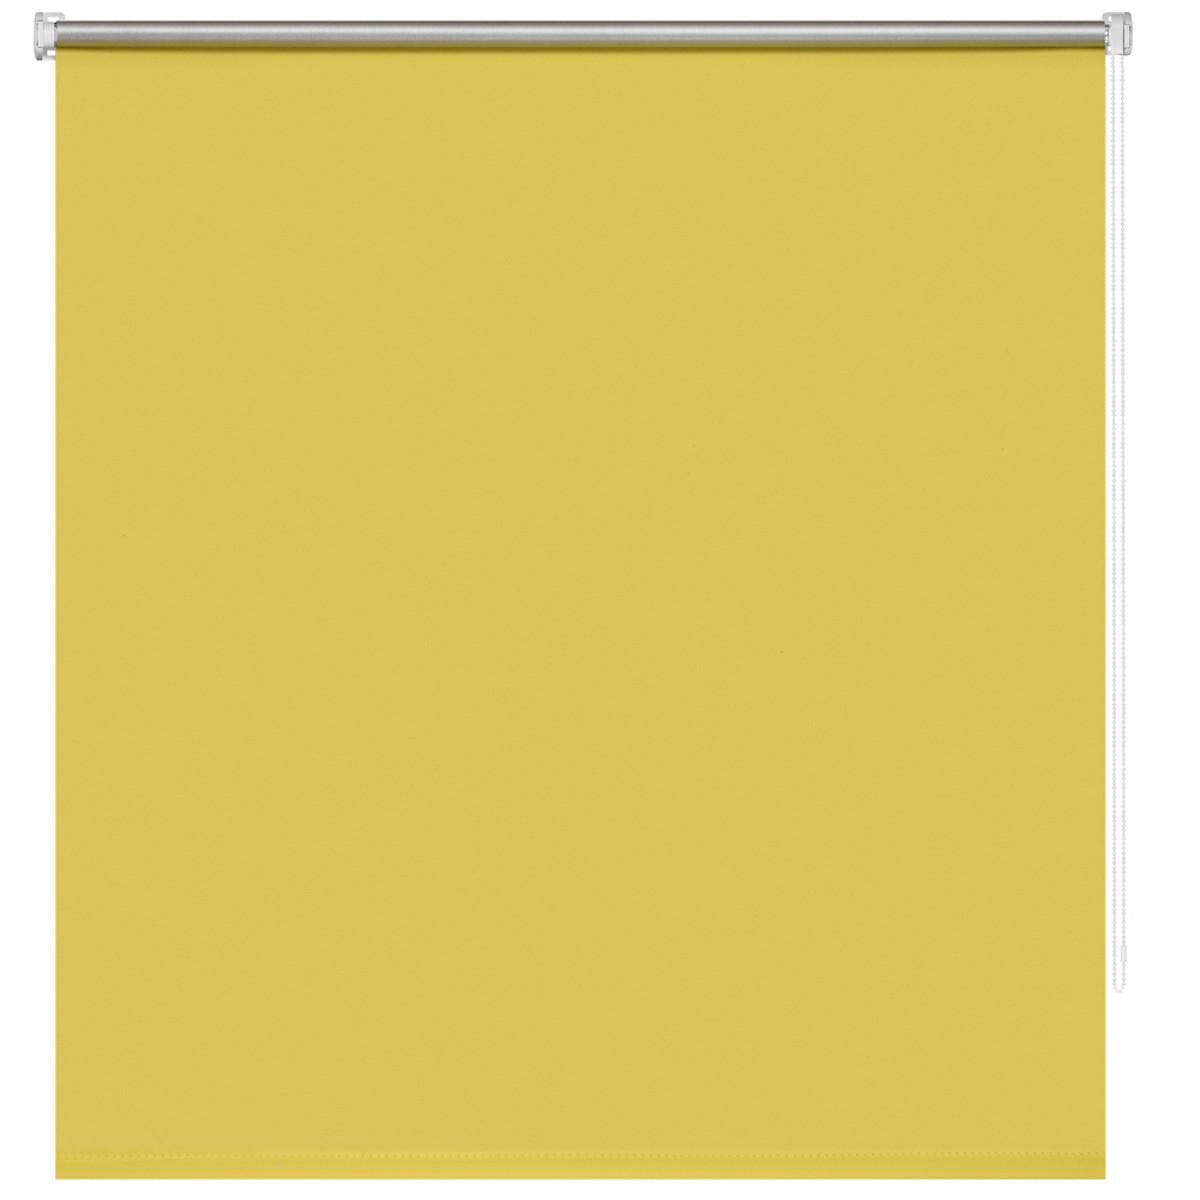 Рулонная Ора Decofest Плайн 120Х160 Цвет Желтый